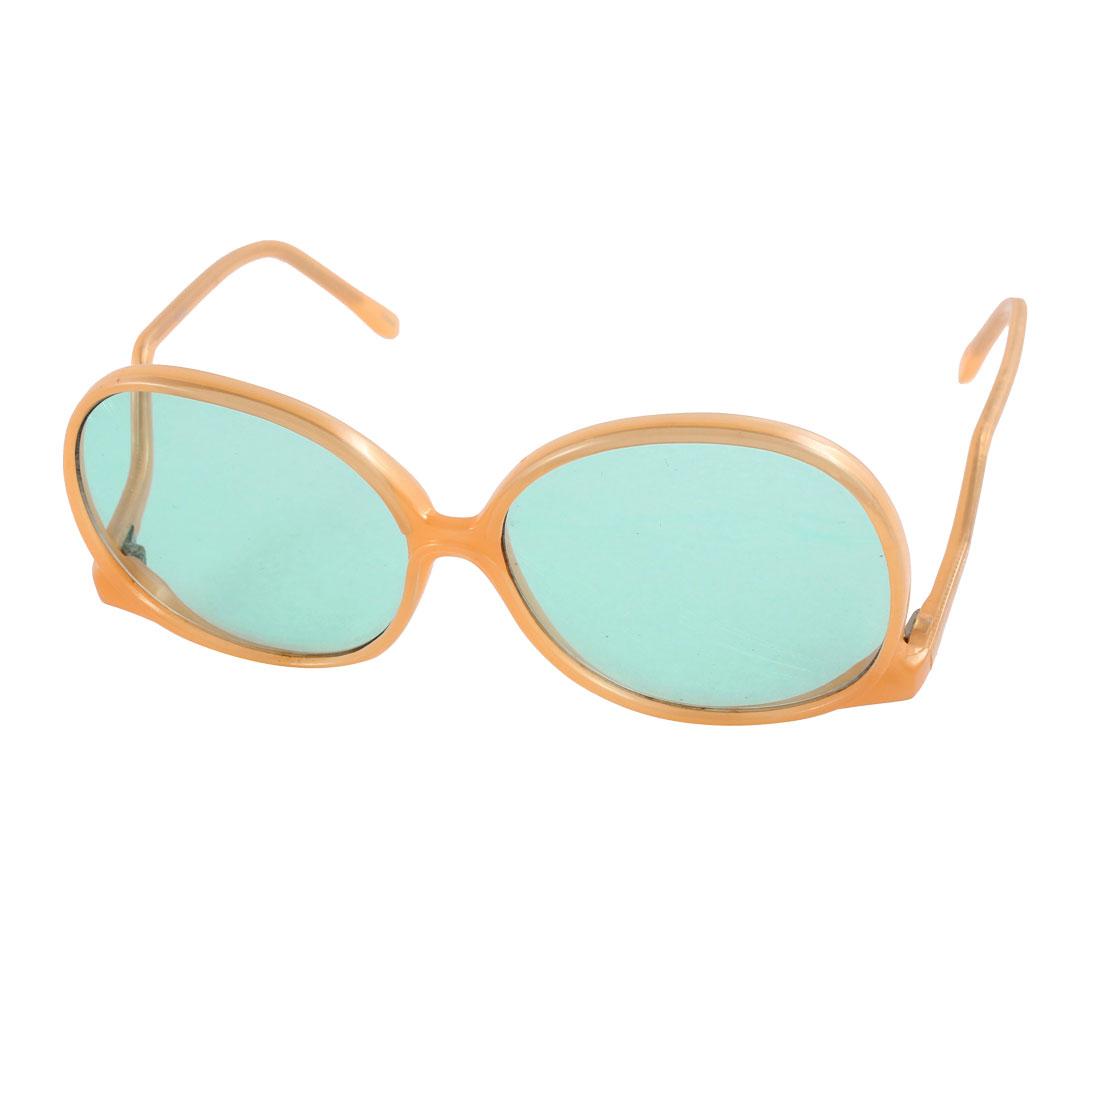 Light Orange Plastic Round Shape Full Rim Single Bridge Sunglasses for Lady